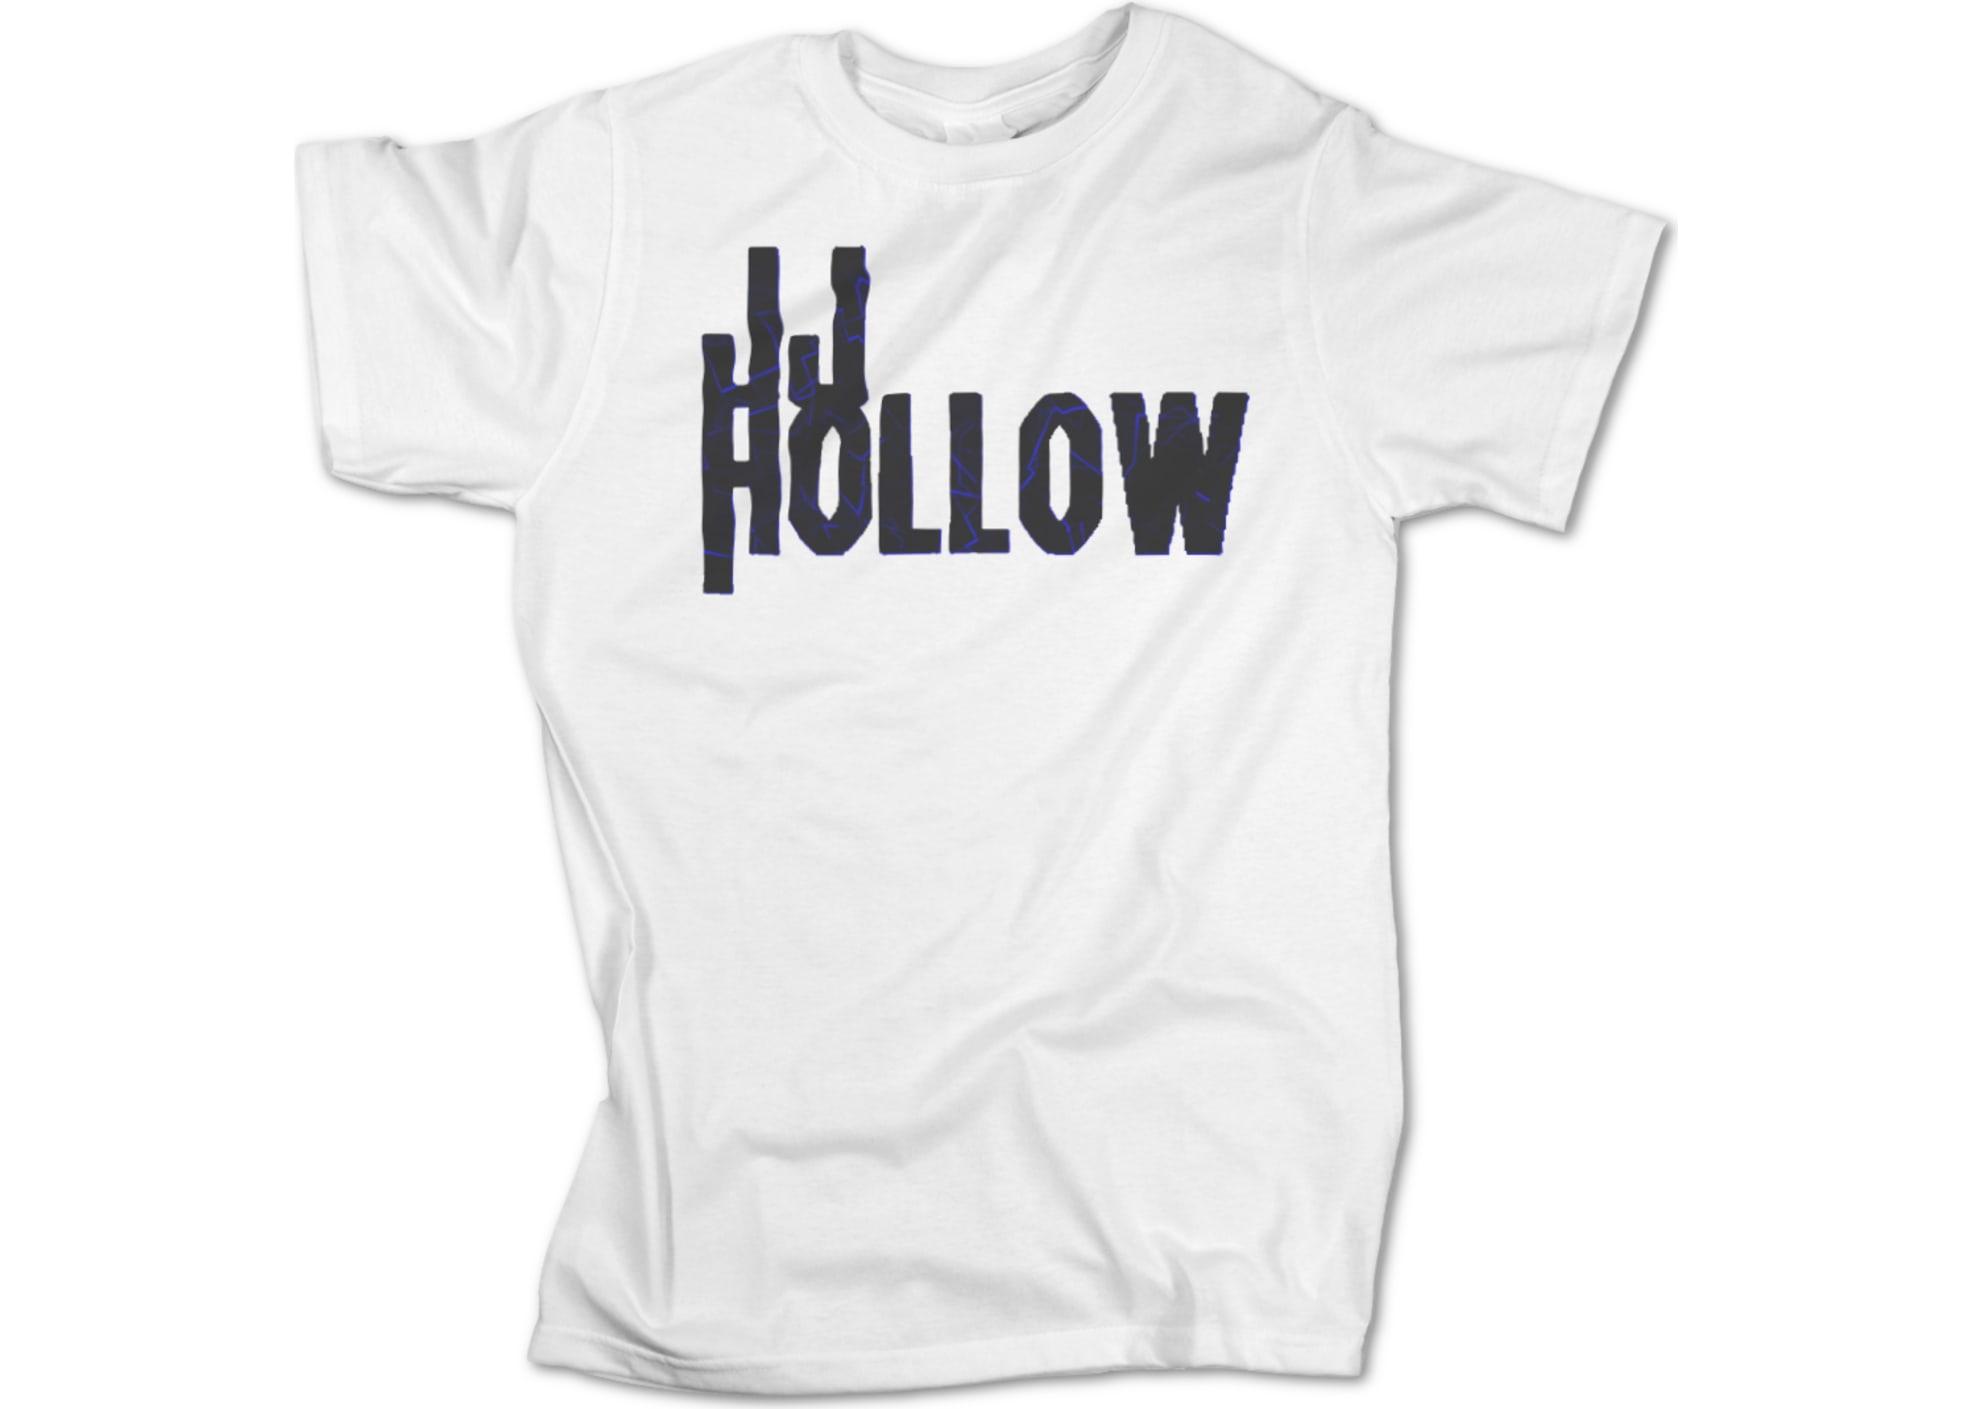 Jj hollow hollow  white  1595803986